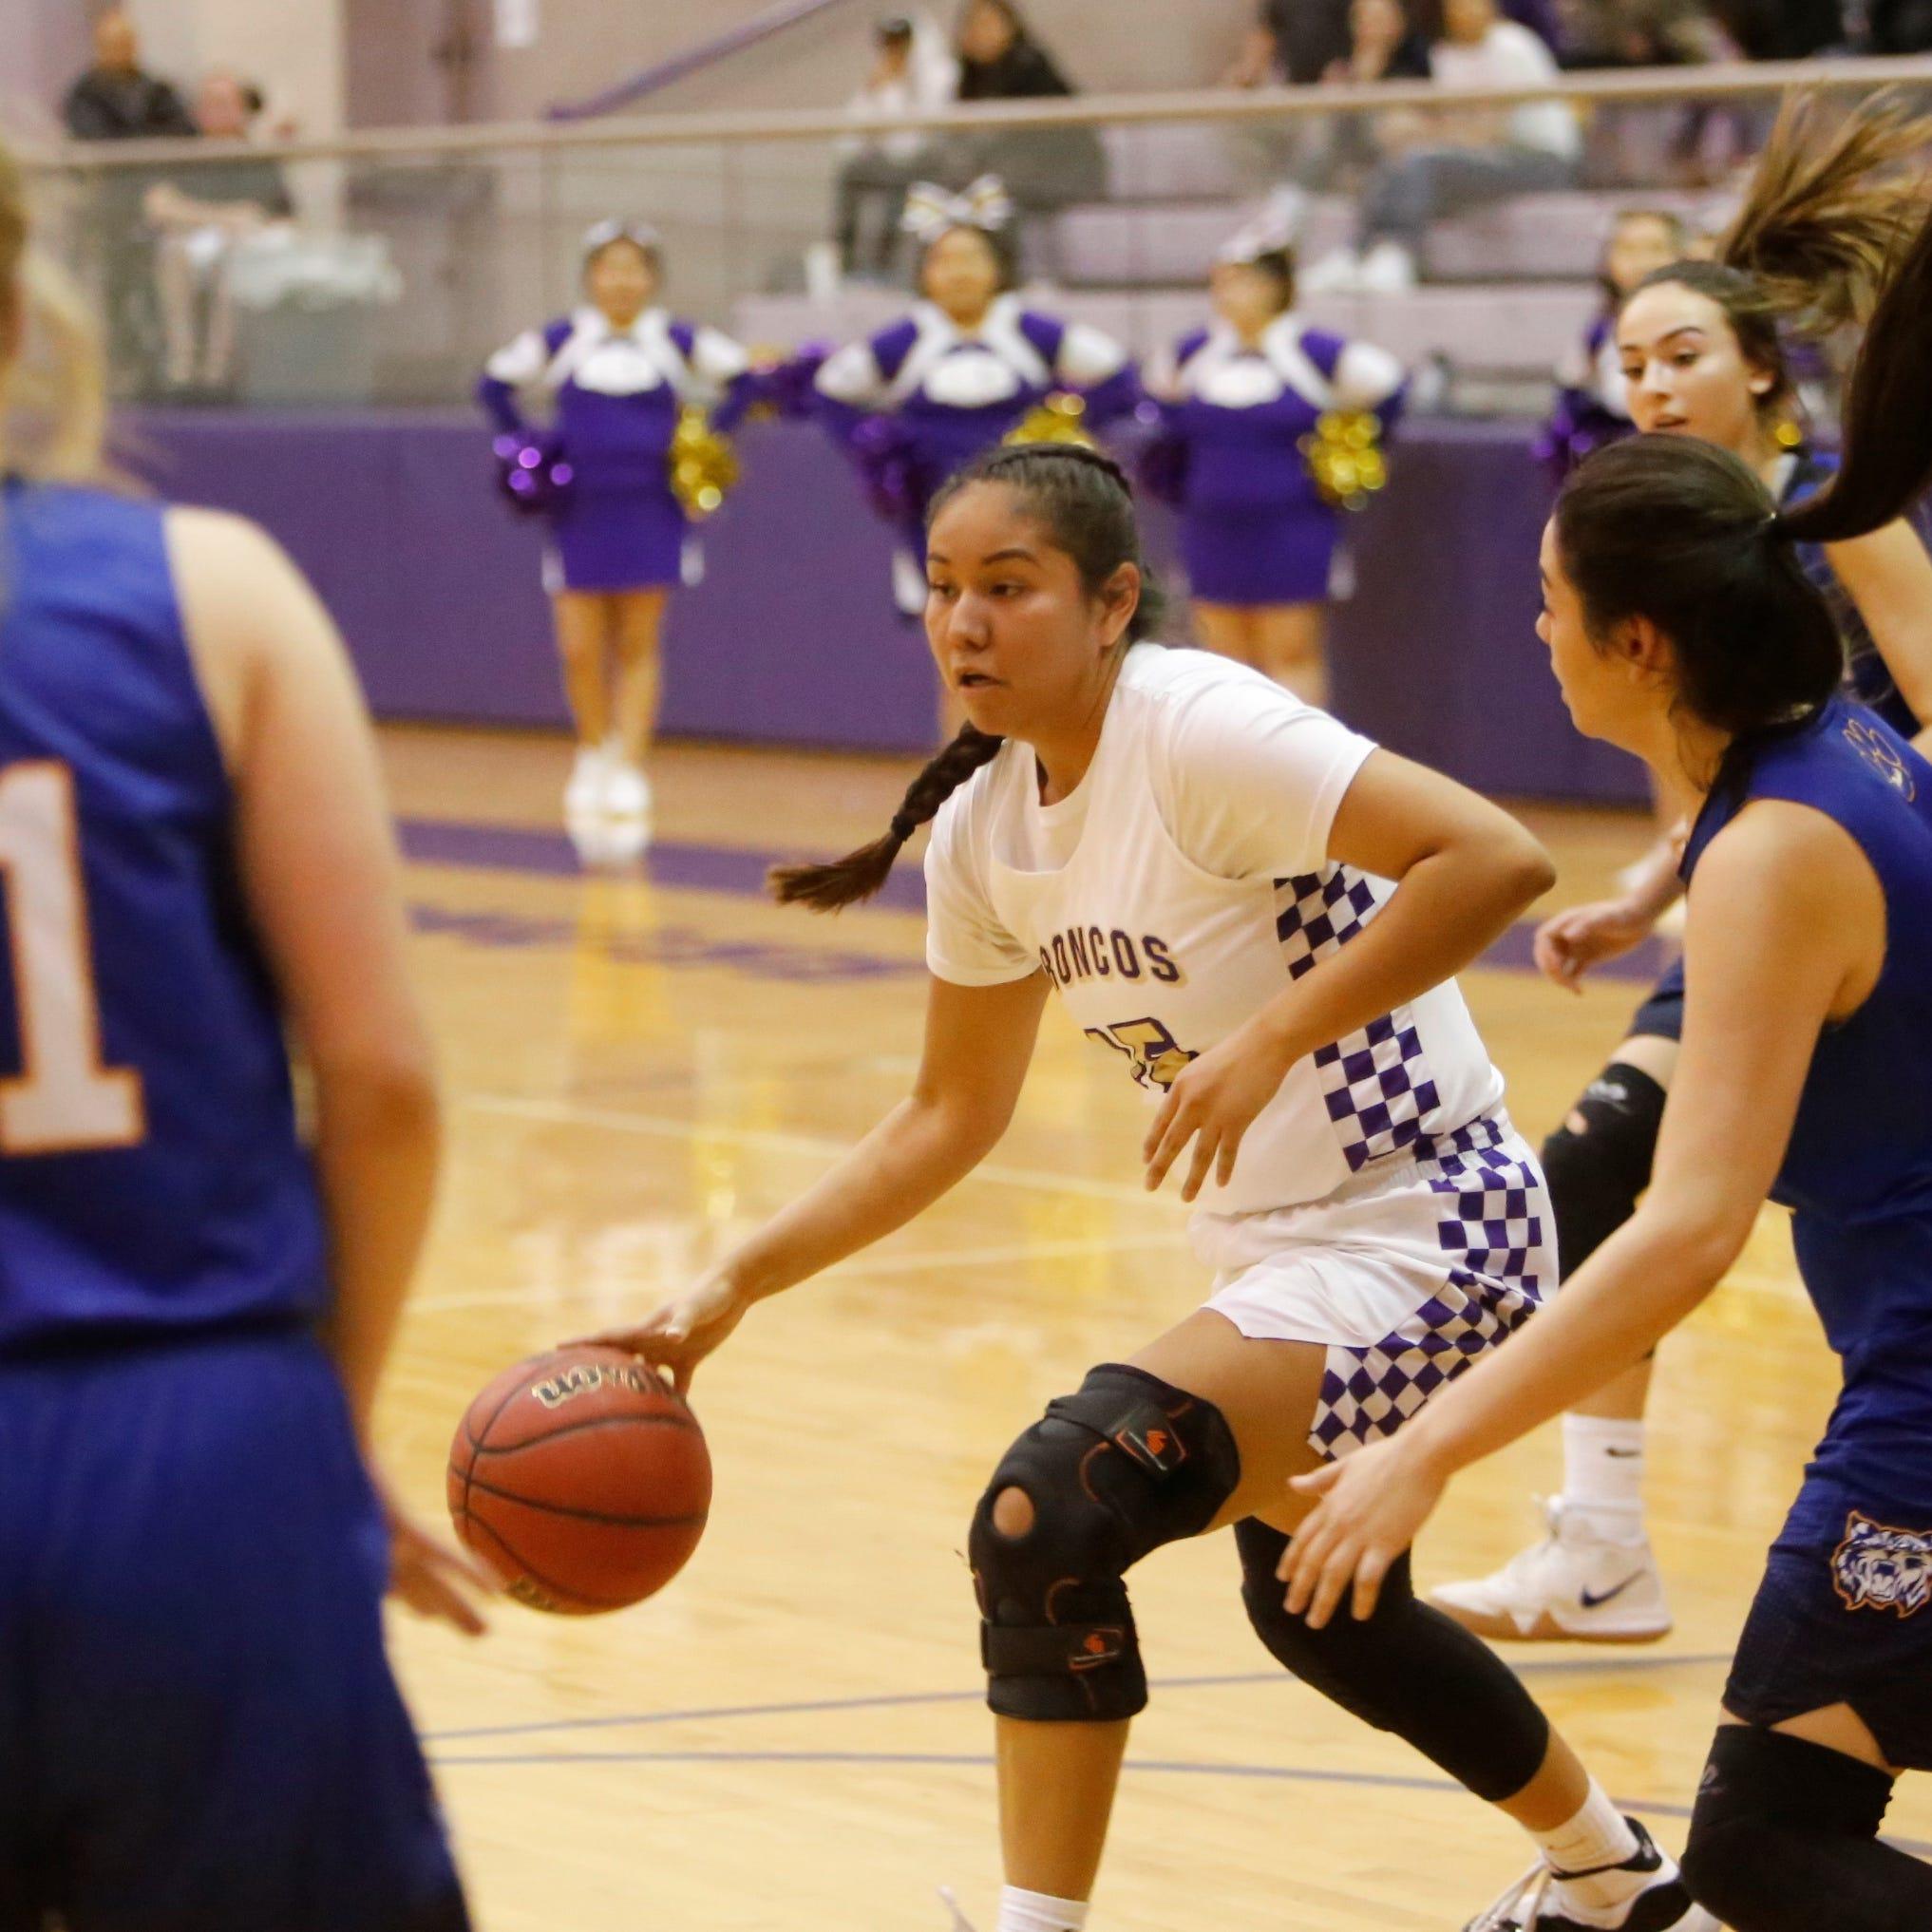 Kirtland girls basketball get No. 1 seed in 4A playoffs